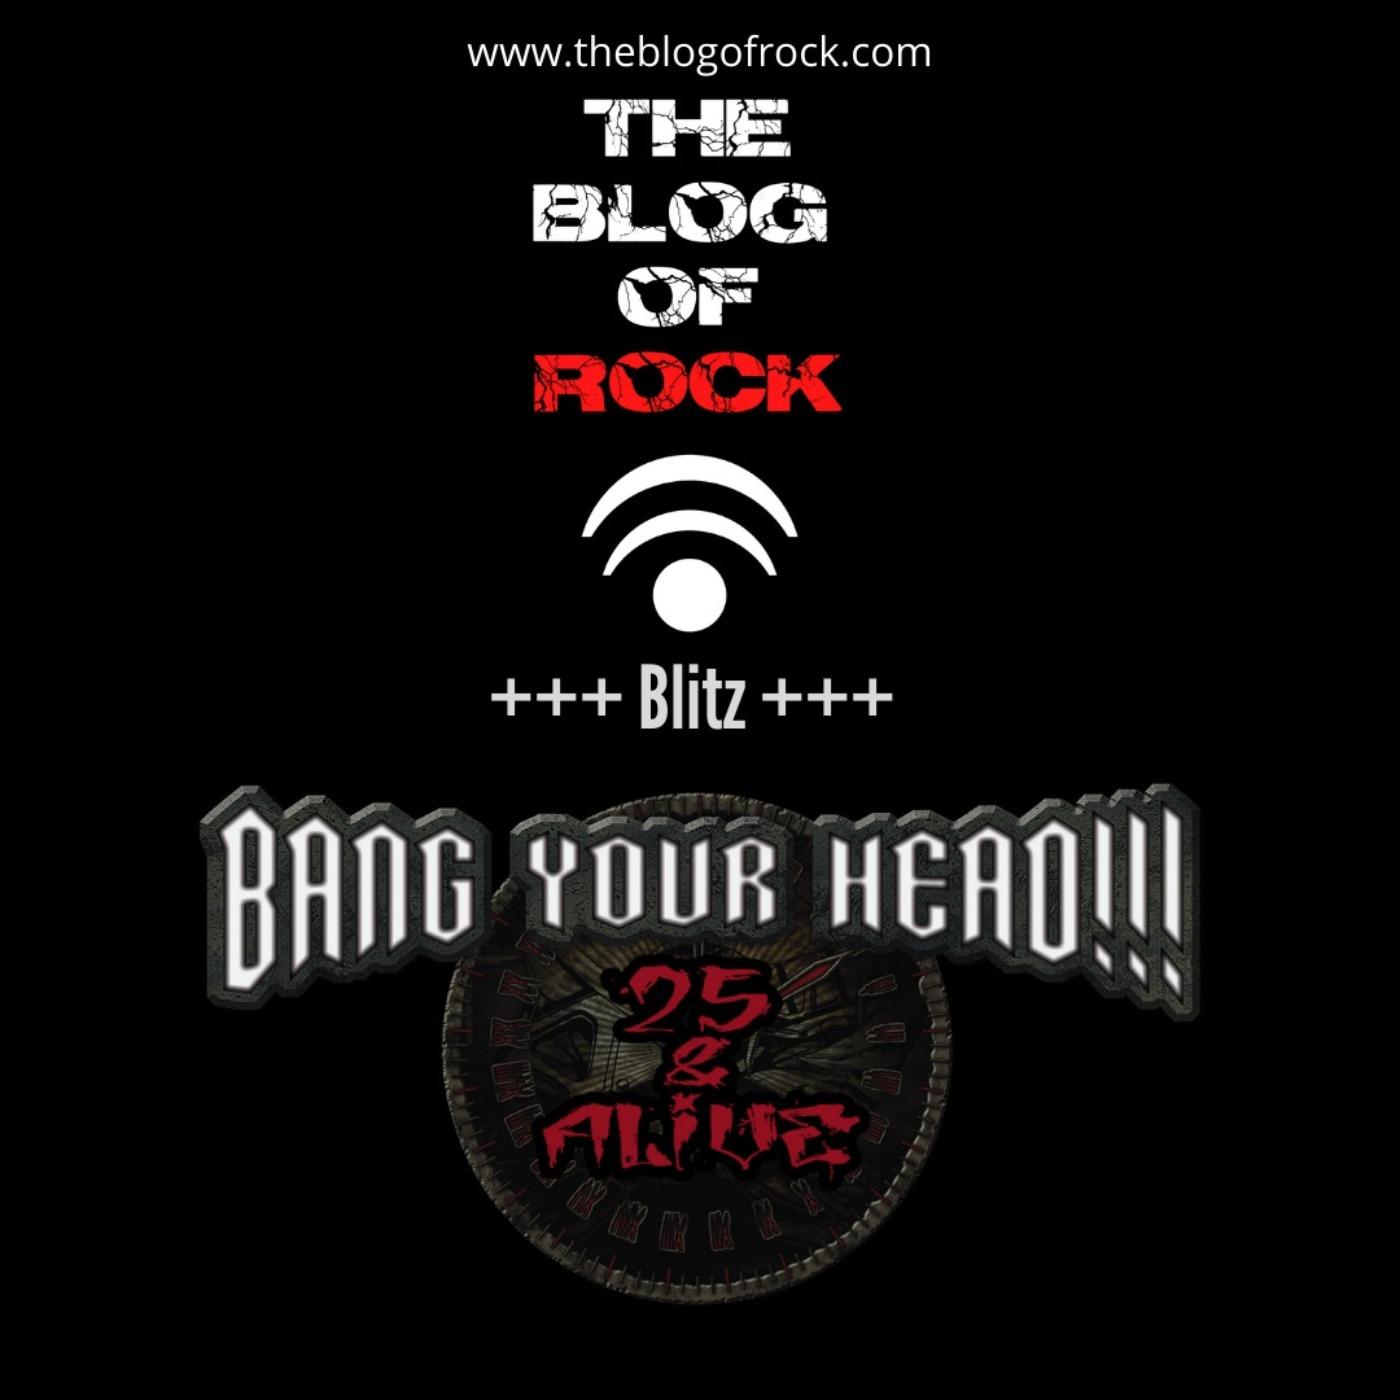 BANG YOUR HEAD!!! Festival 2020